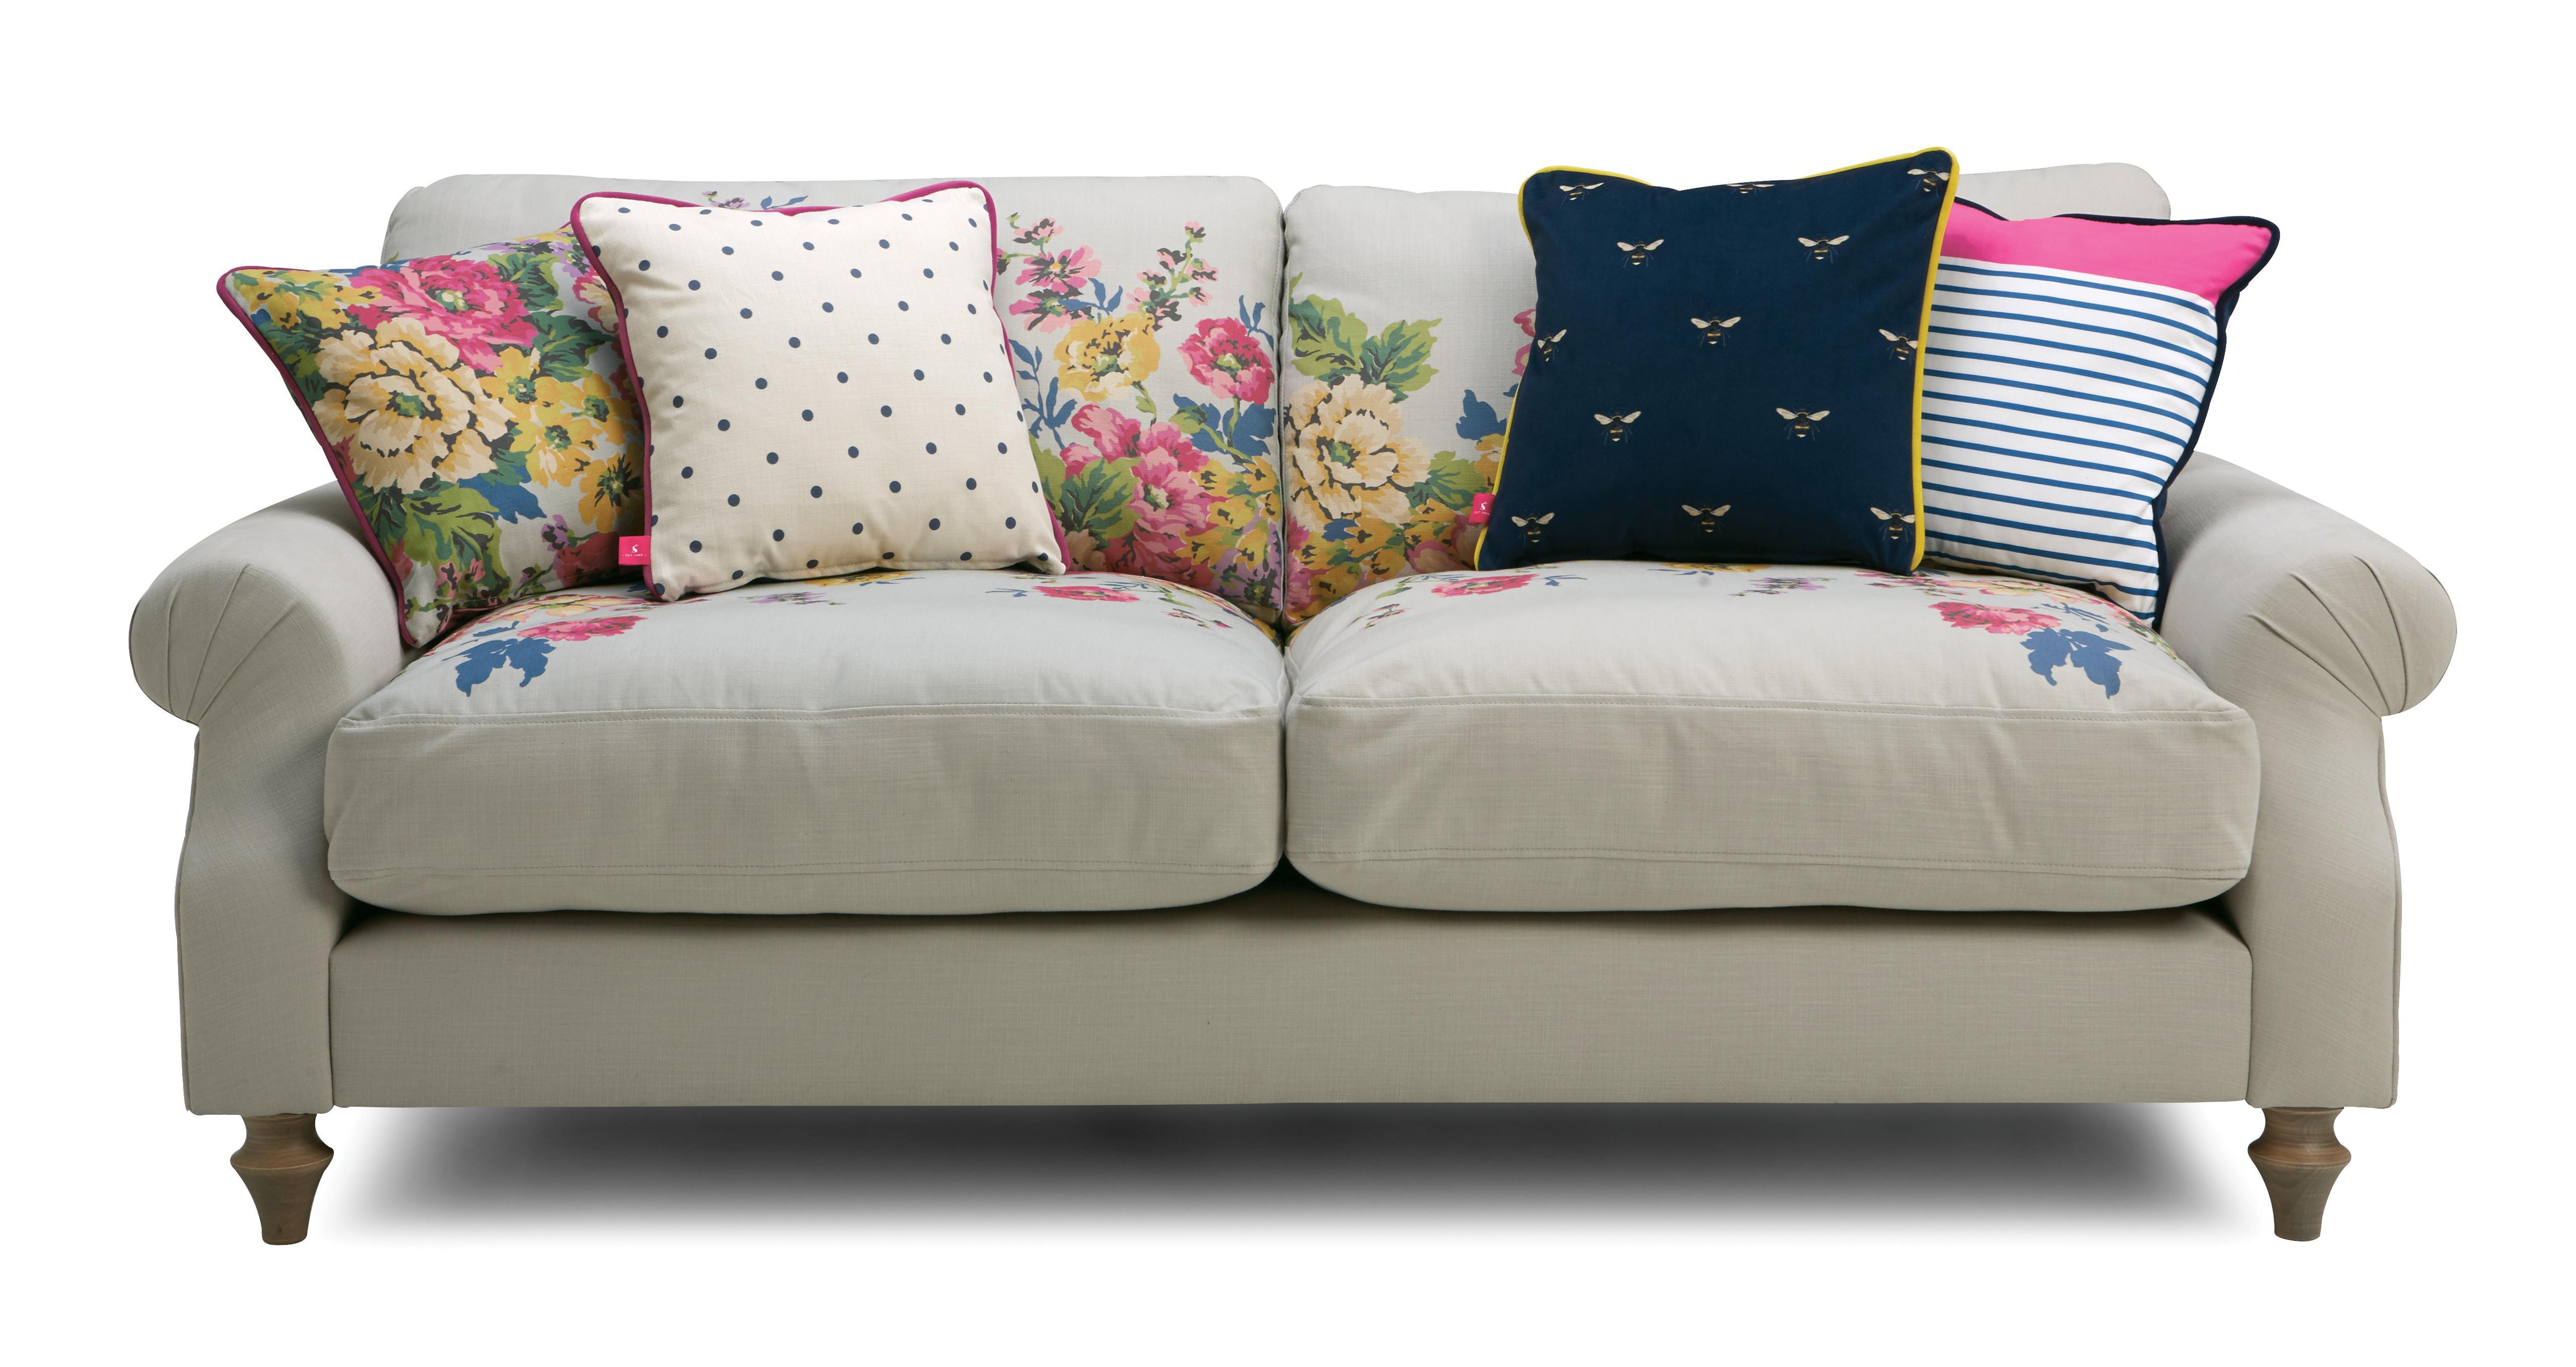 Cambridge Cotton 3 Seater Sofa Cambridge Plain And Floral